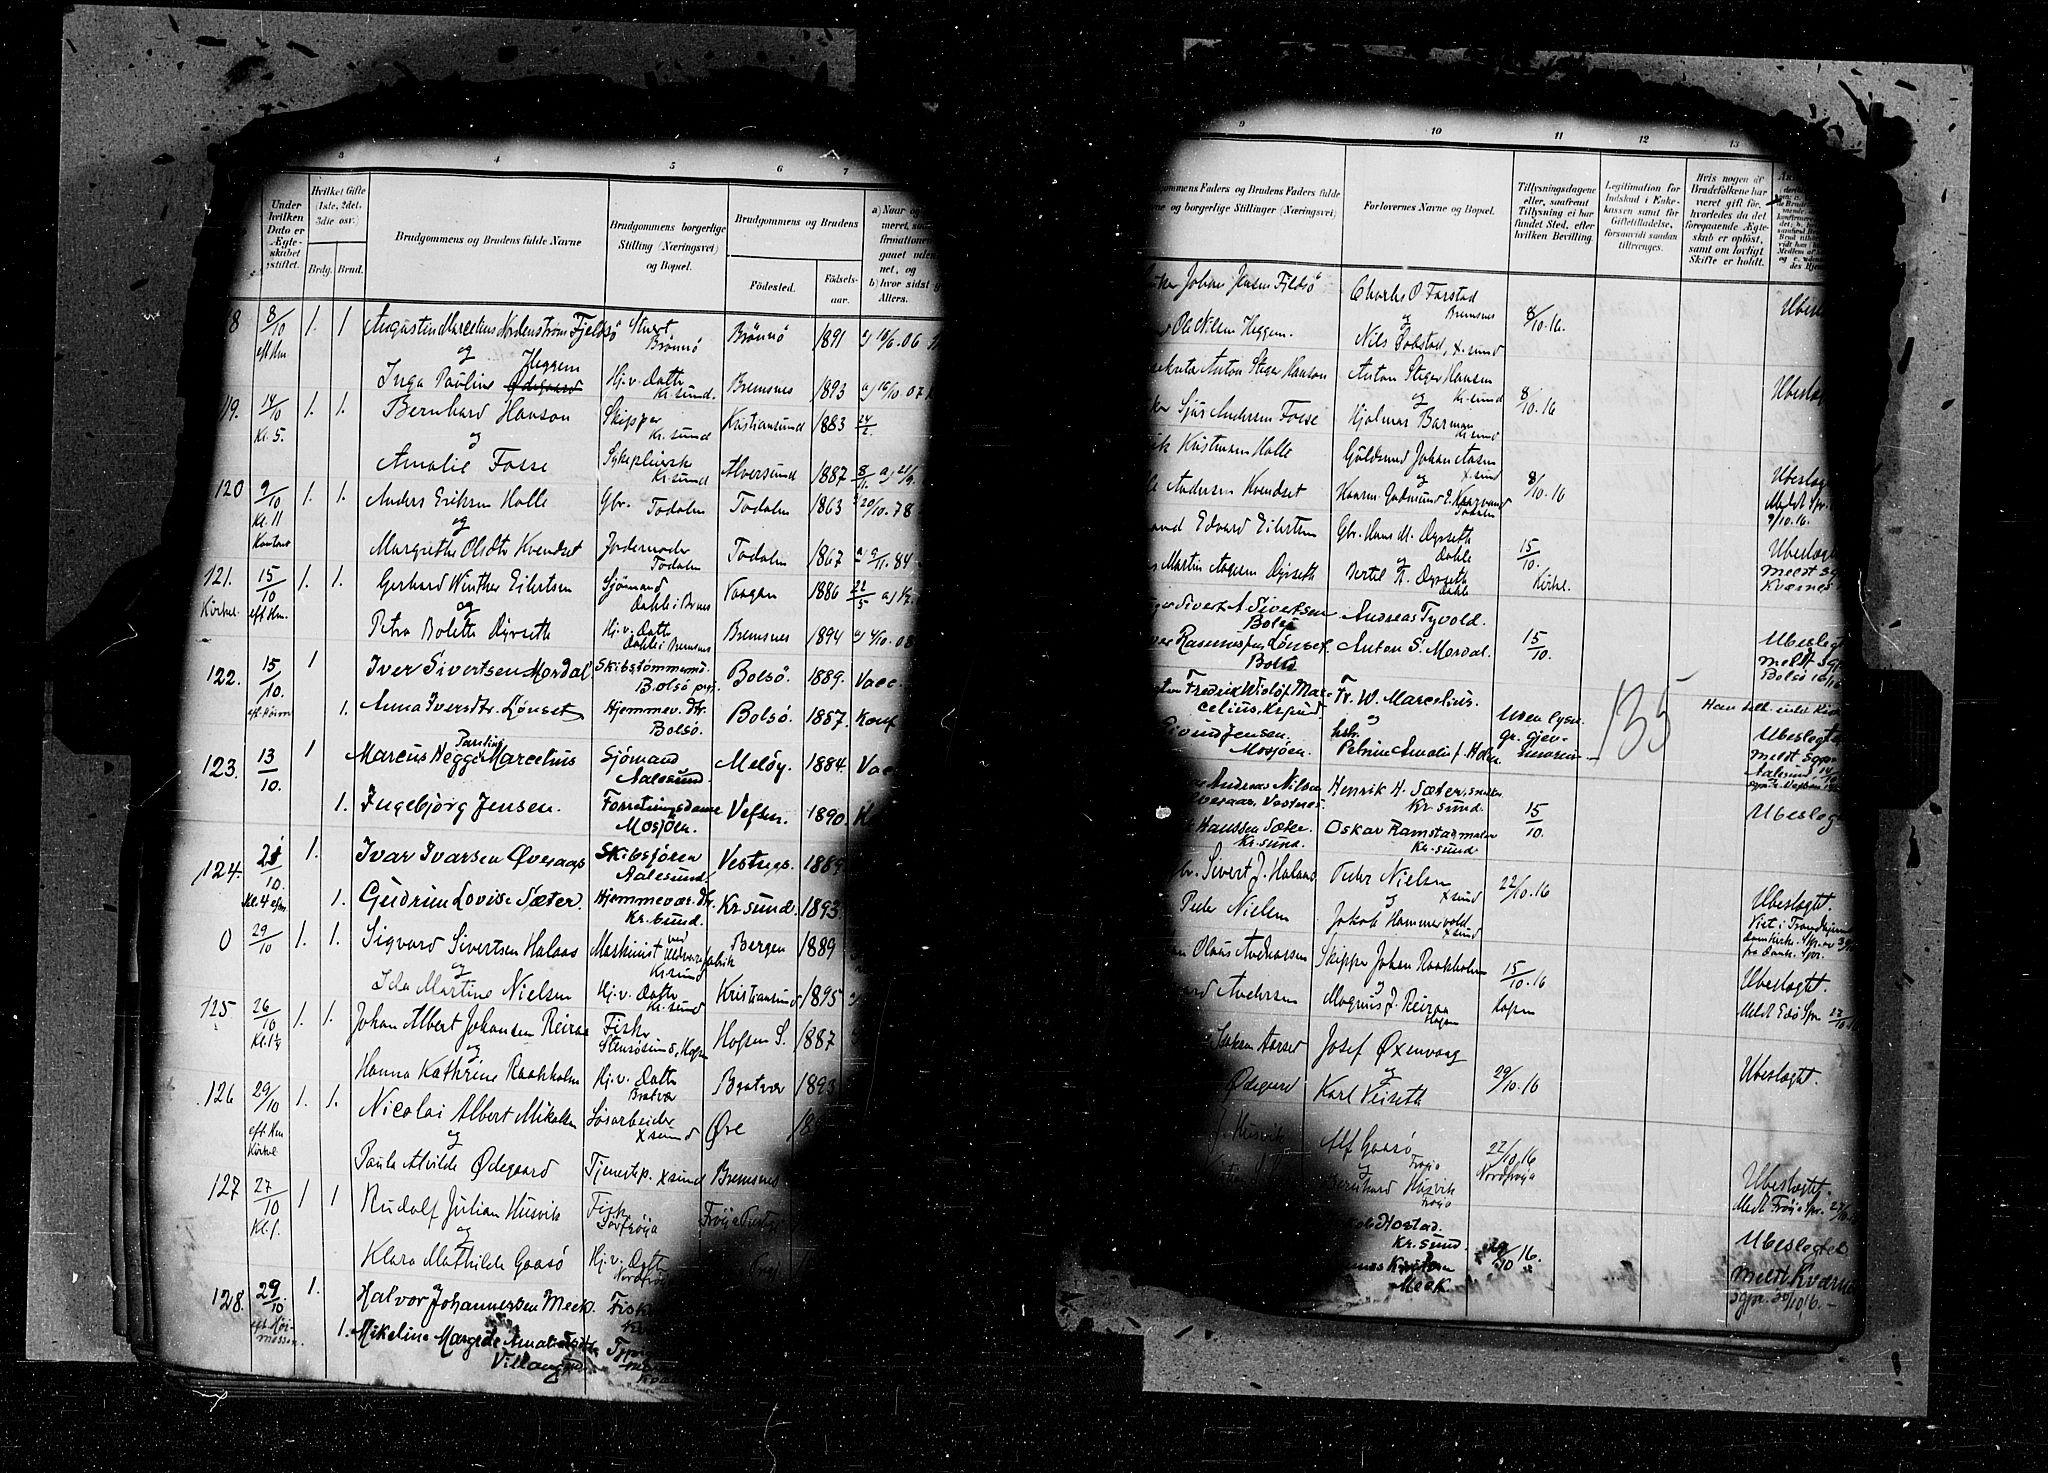 SAT, Arkivreferanse ukjent*, Parish register (official) no. 6d, 1905-1917, p. 135